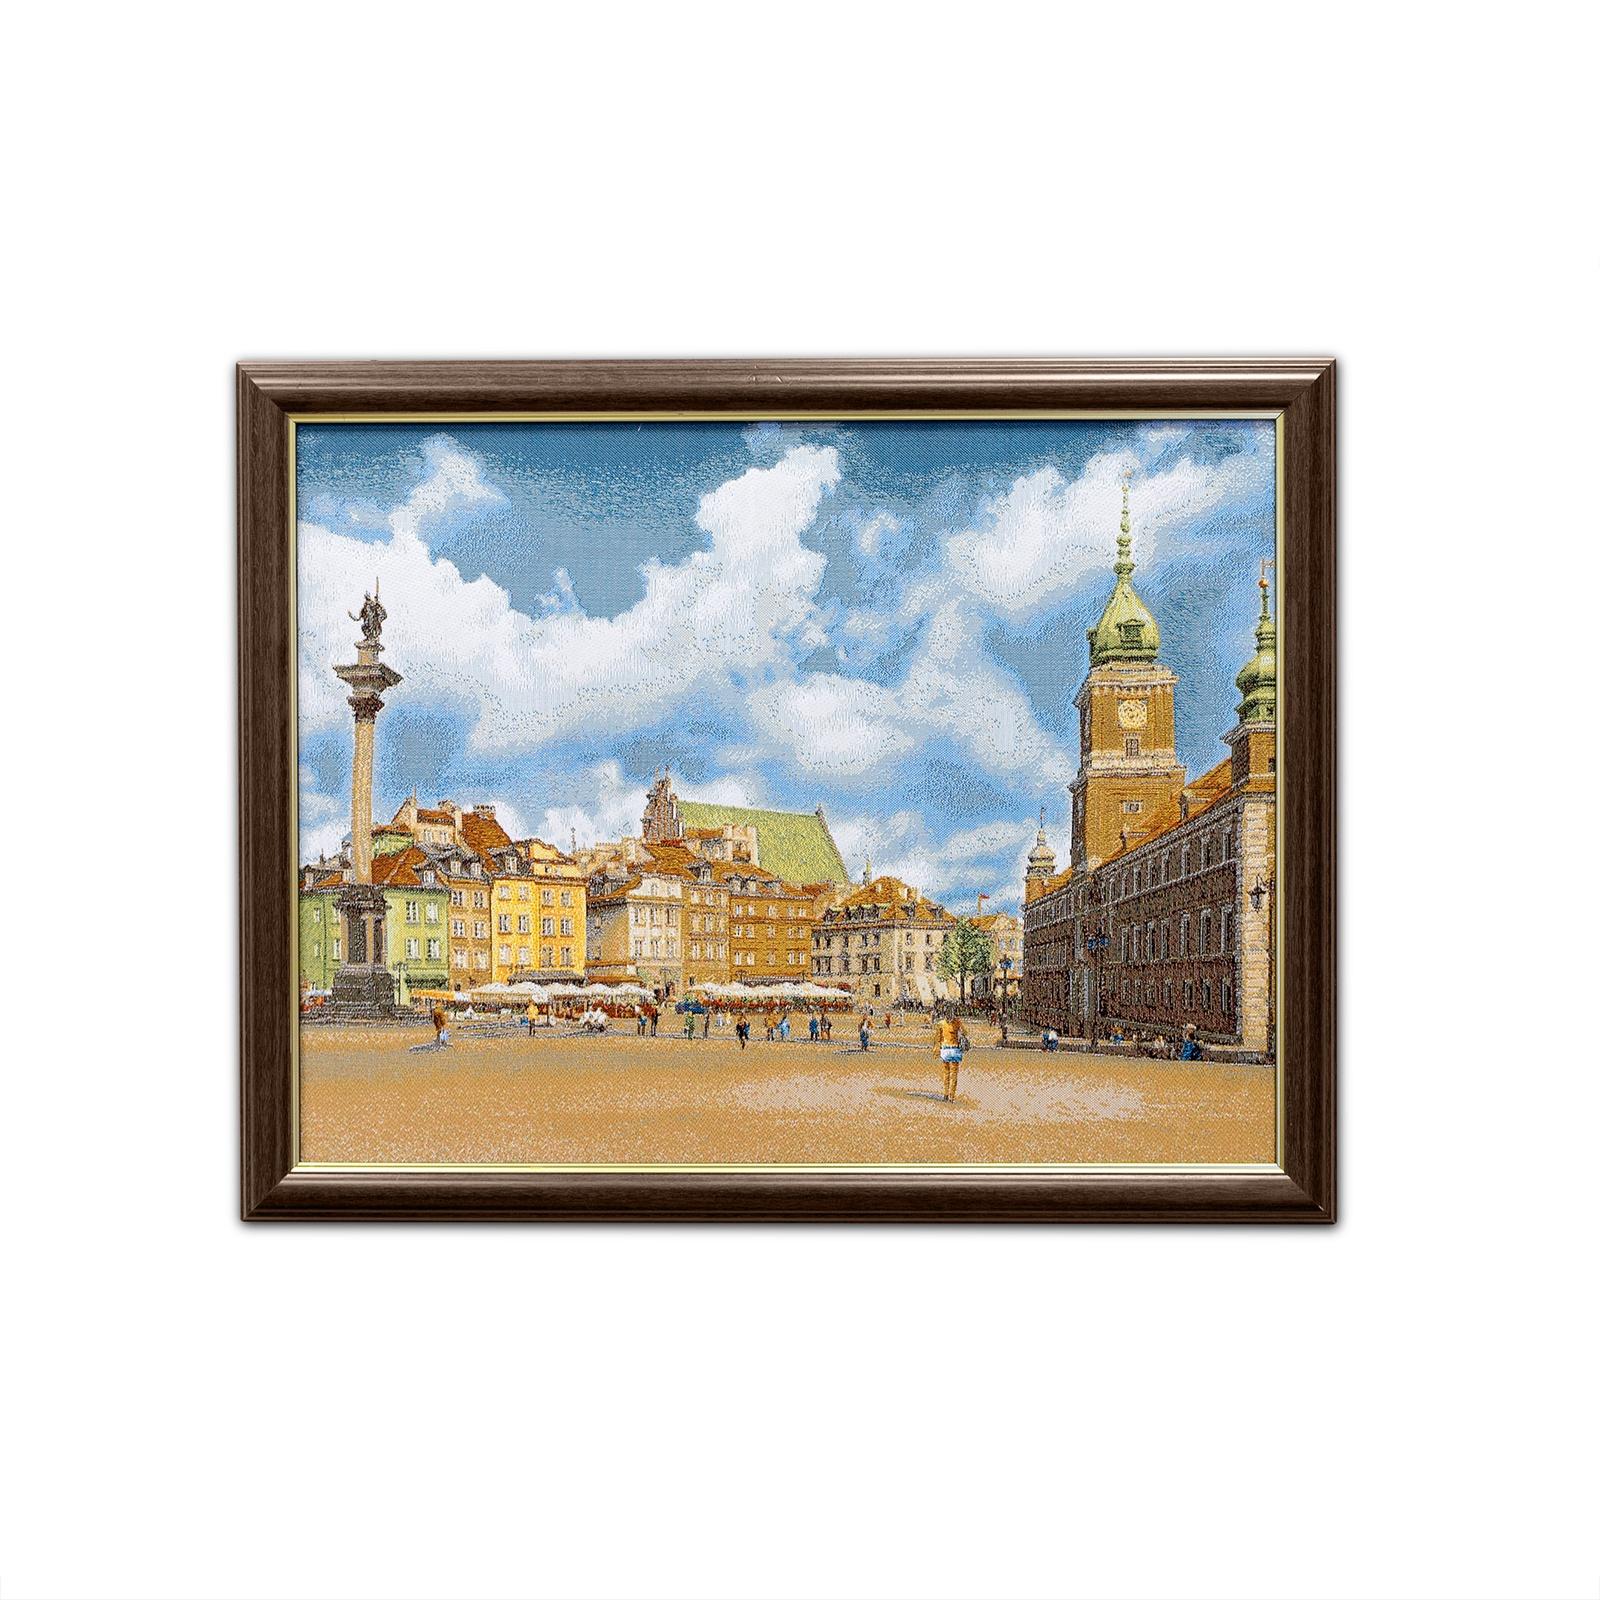 Картина Магазин гобеленов Варшава площадь 40*51 см, Гобелен стоимость авиабилета москва варшава